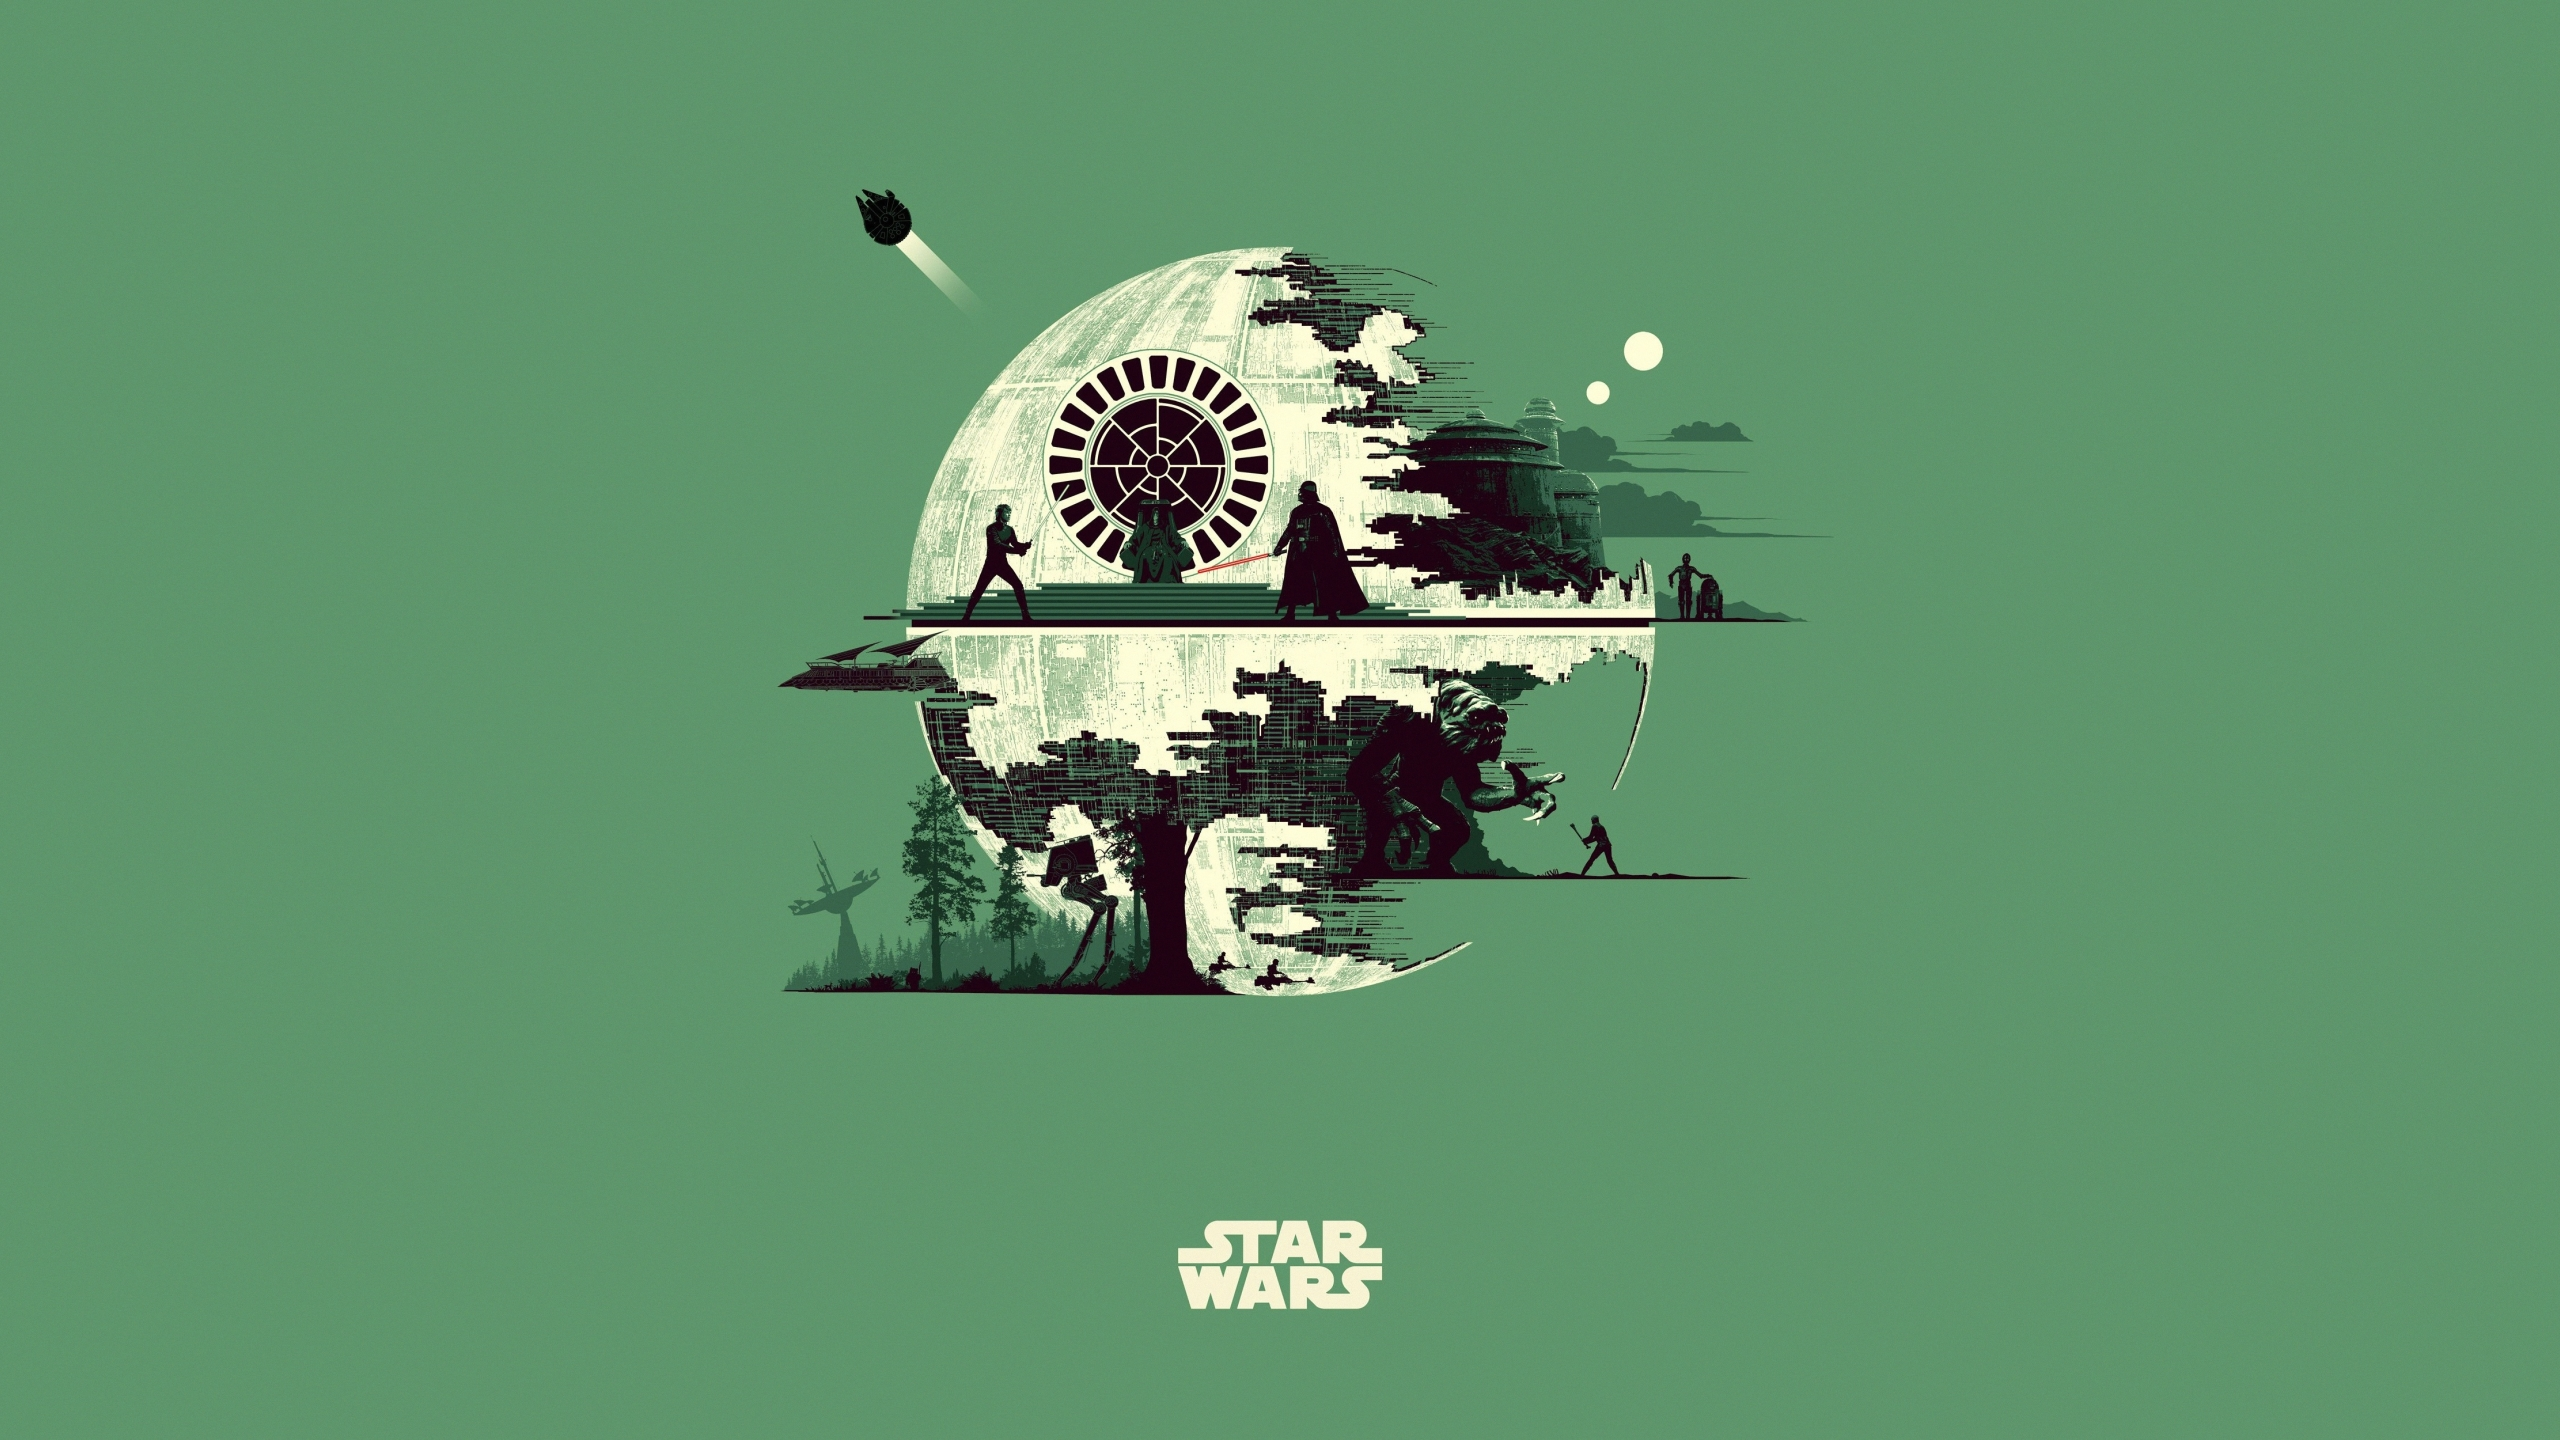 2560x1440 Star Wars Skywalker Saga Minimal 1440p Resolution Wallpaper Hd Movies 4k Wallpapers Images Photos And Background